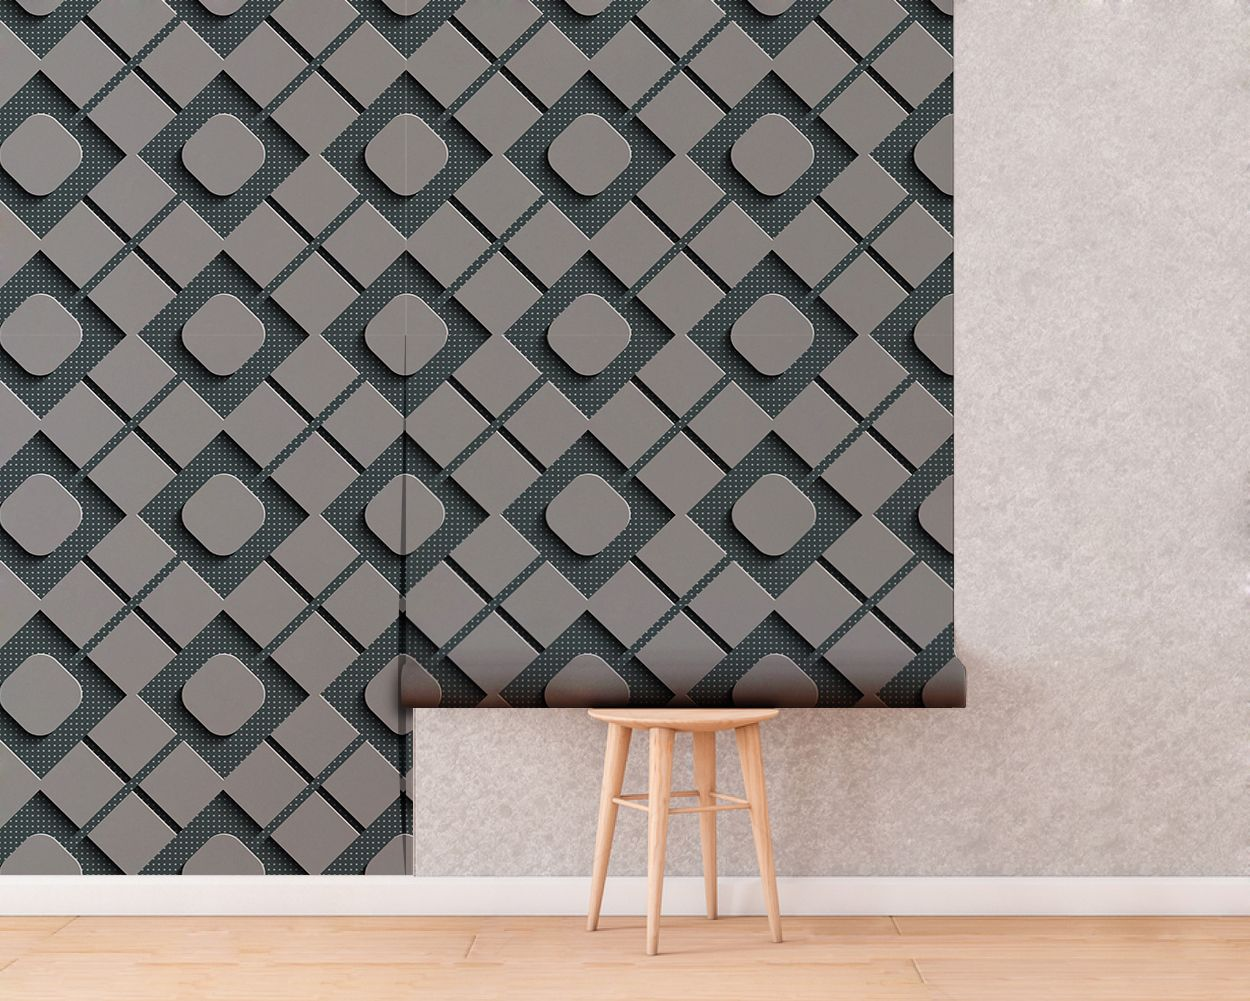 Squares 3d Effect Wallpaper